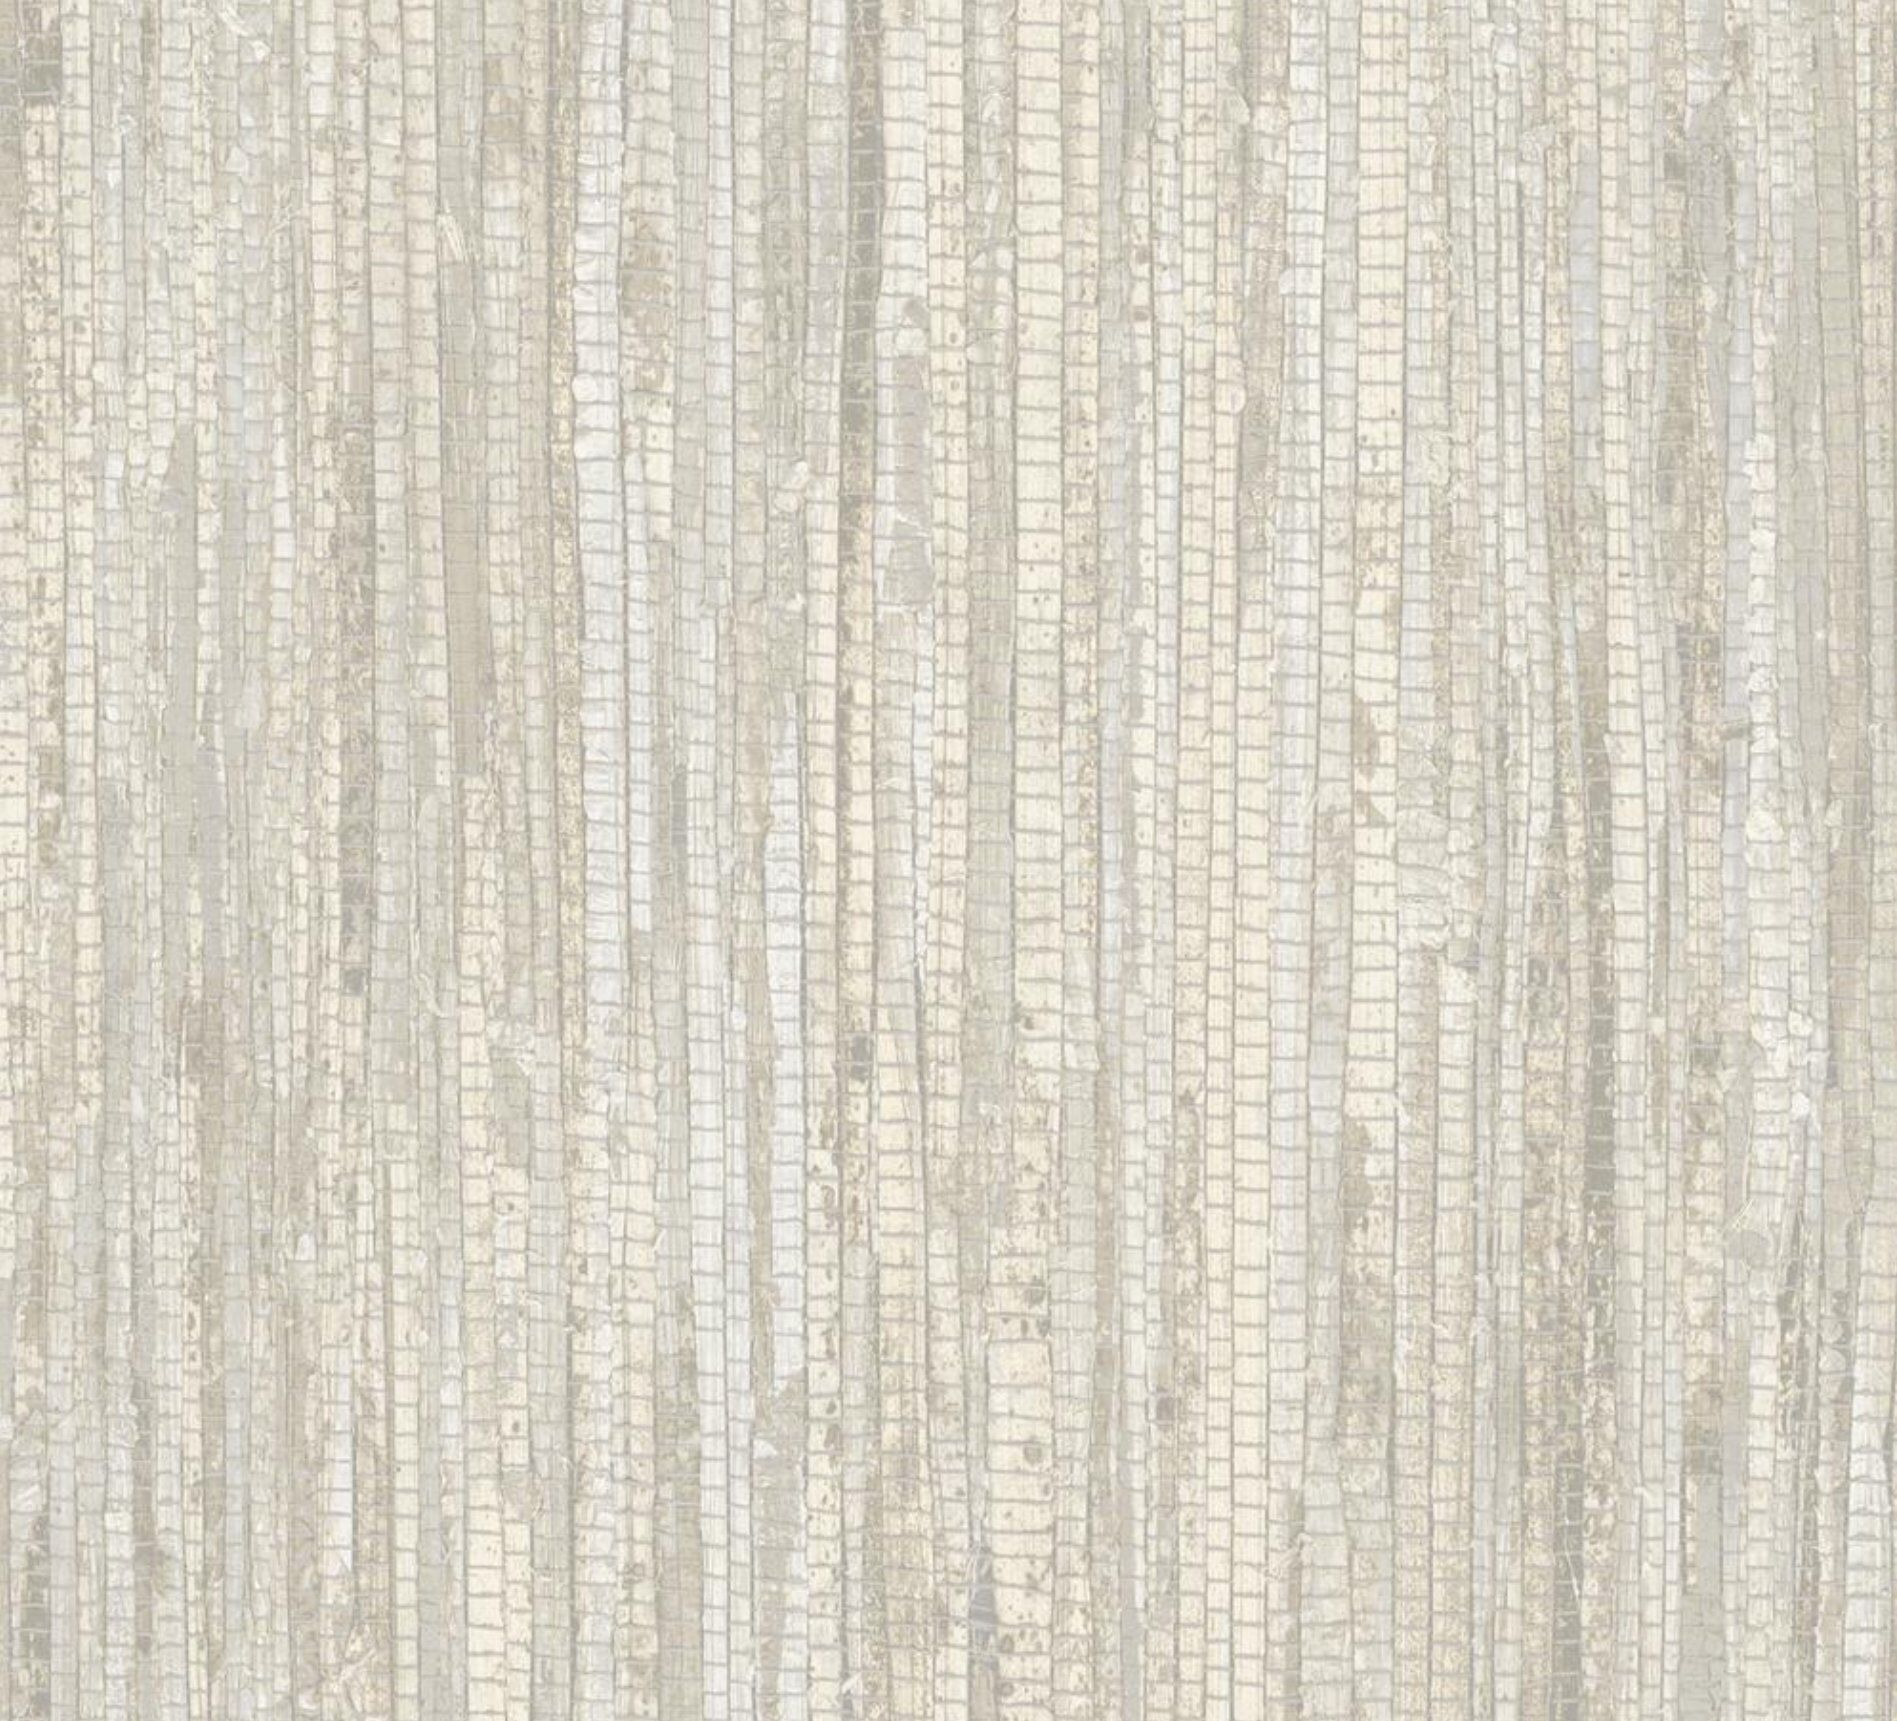 Natural Off White Grass Cloth Wallpaper Neutral Pale